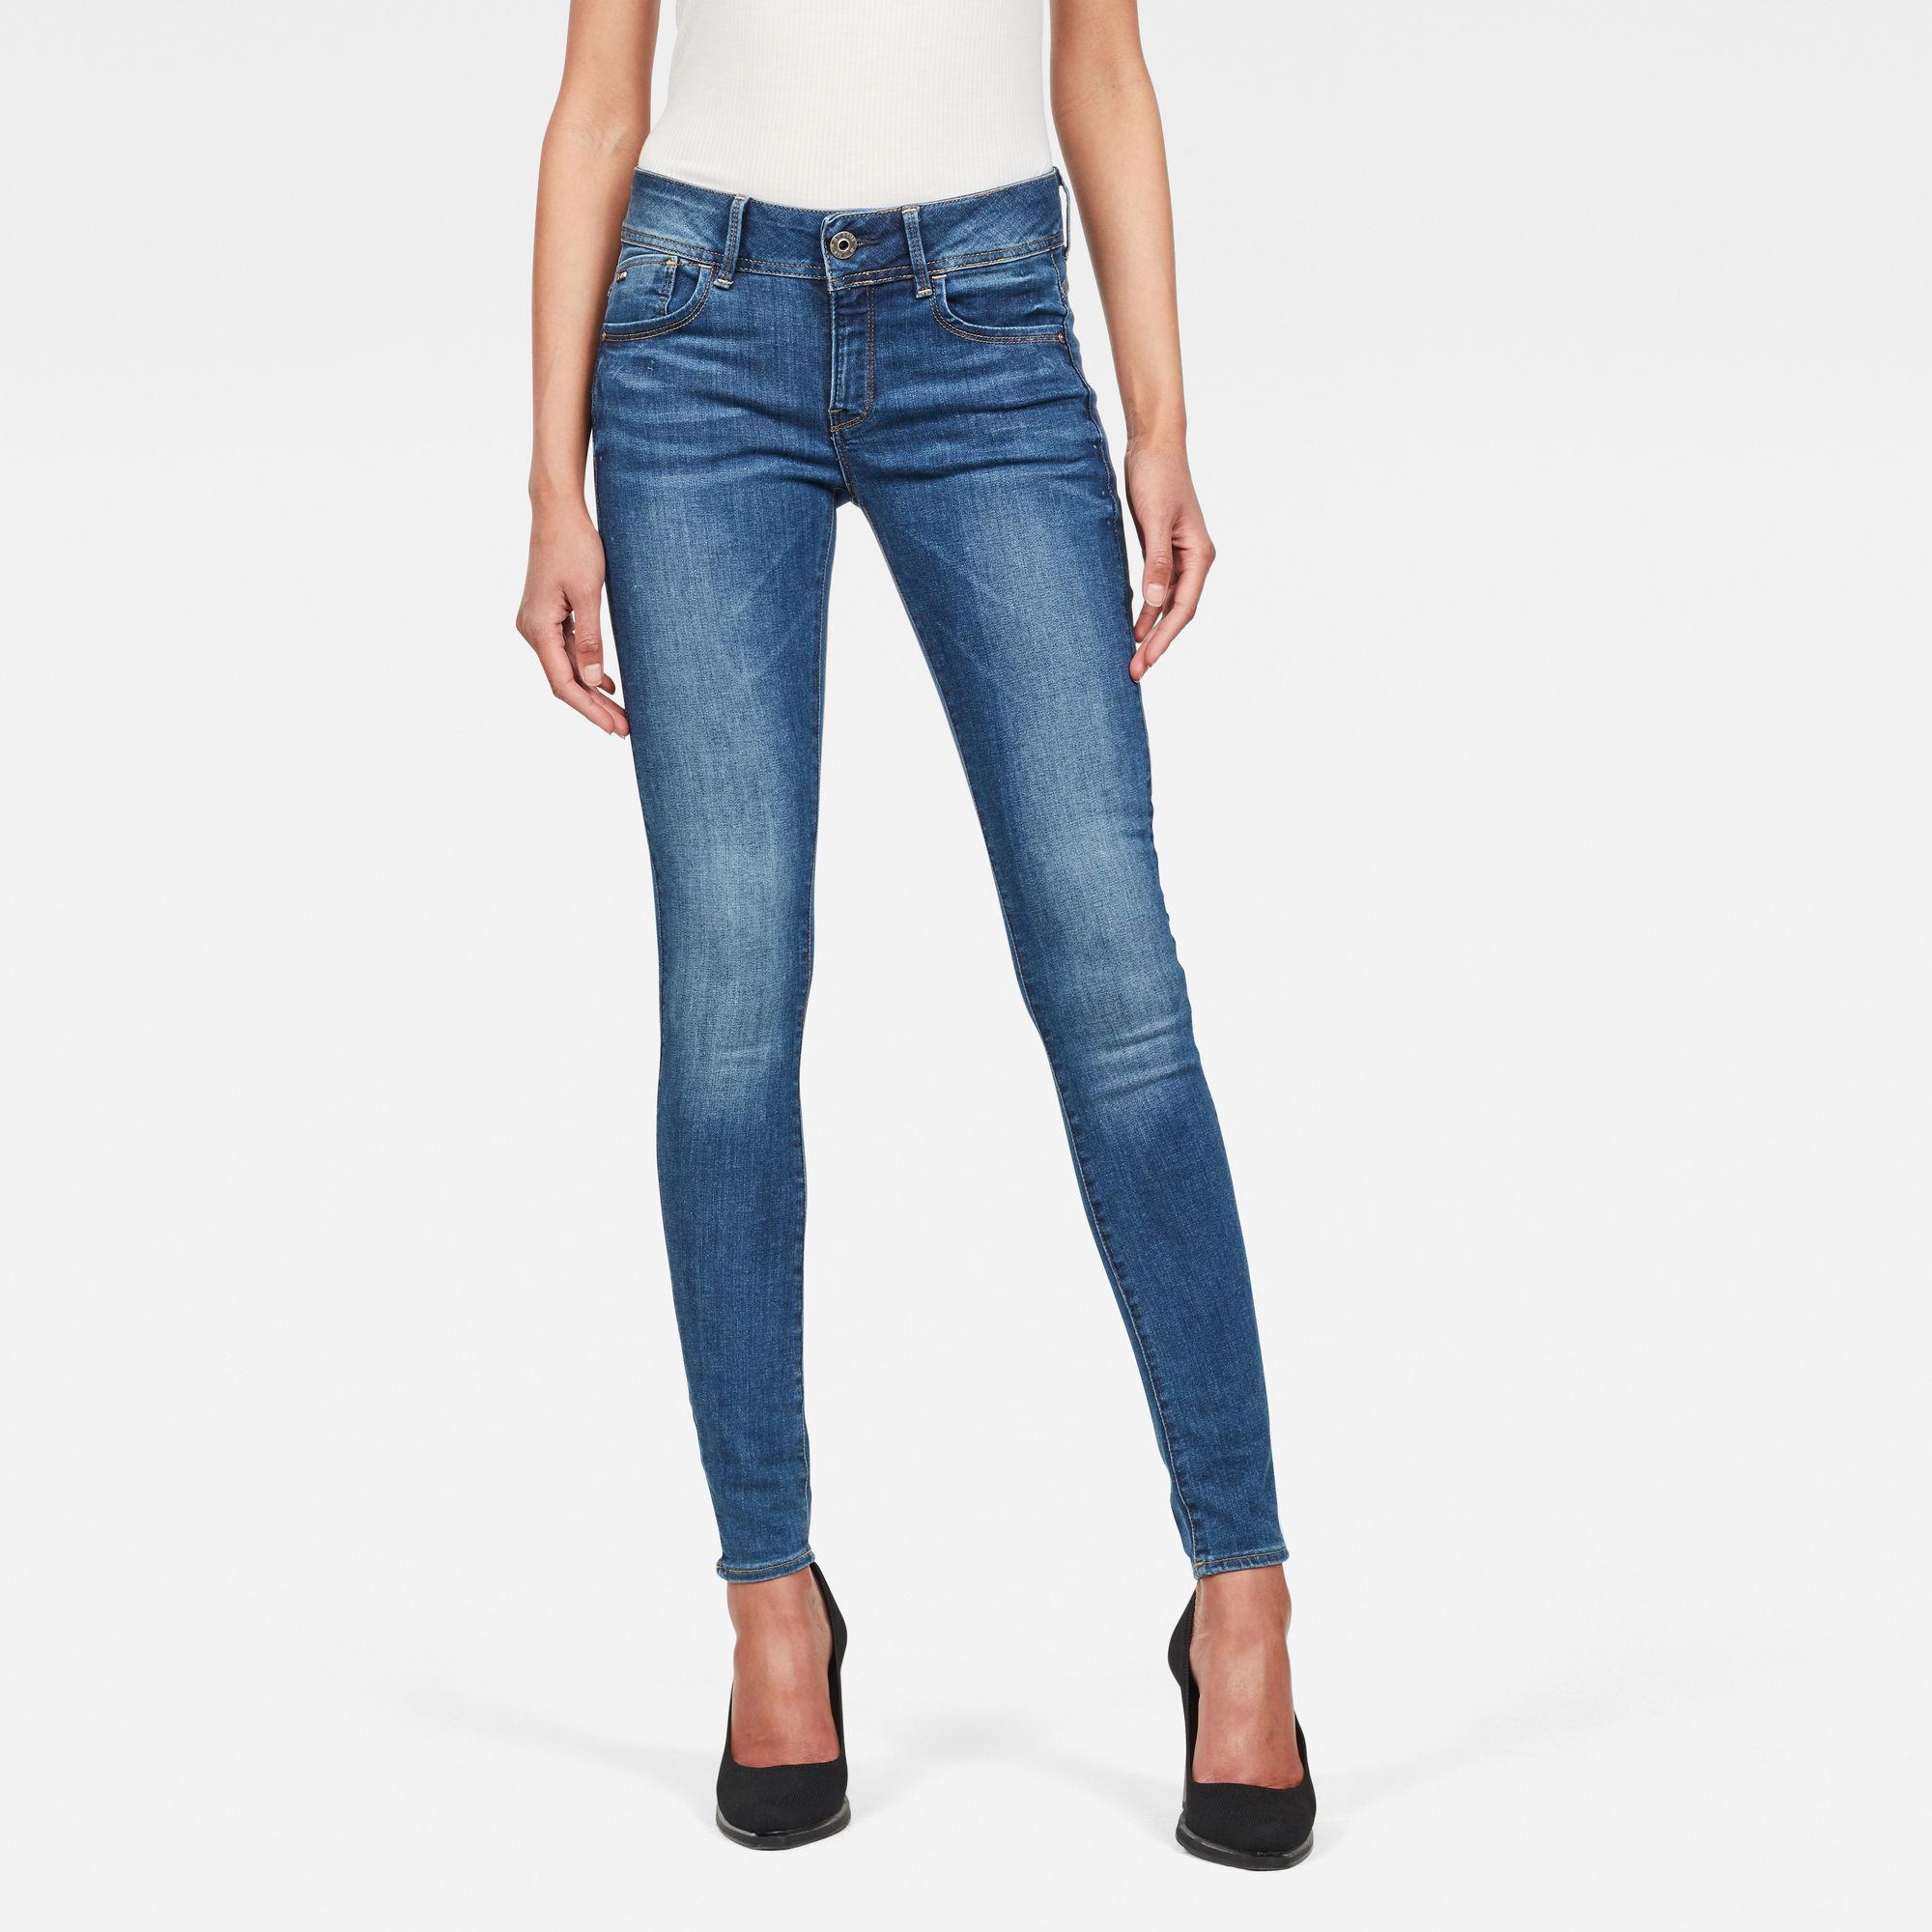 Kleding Lange broeken